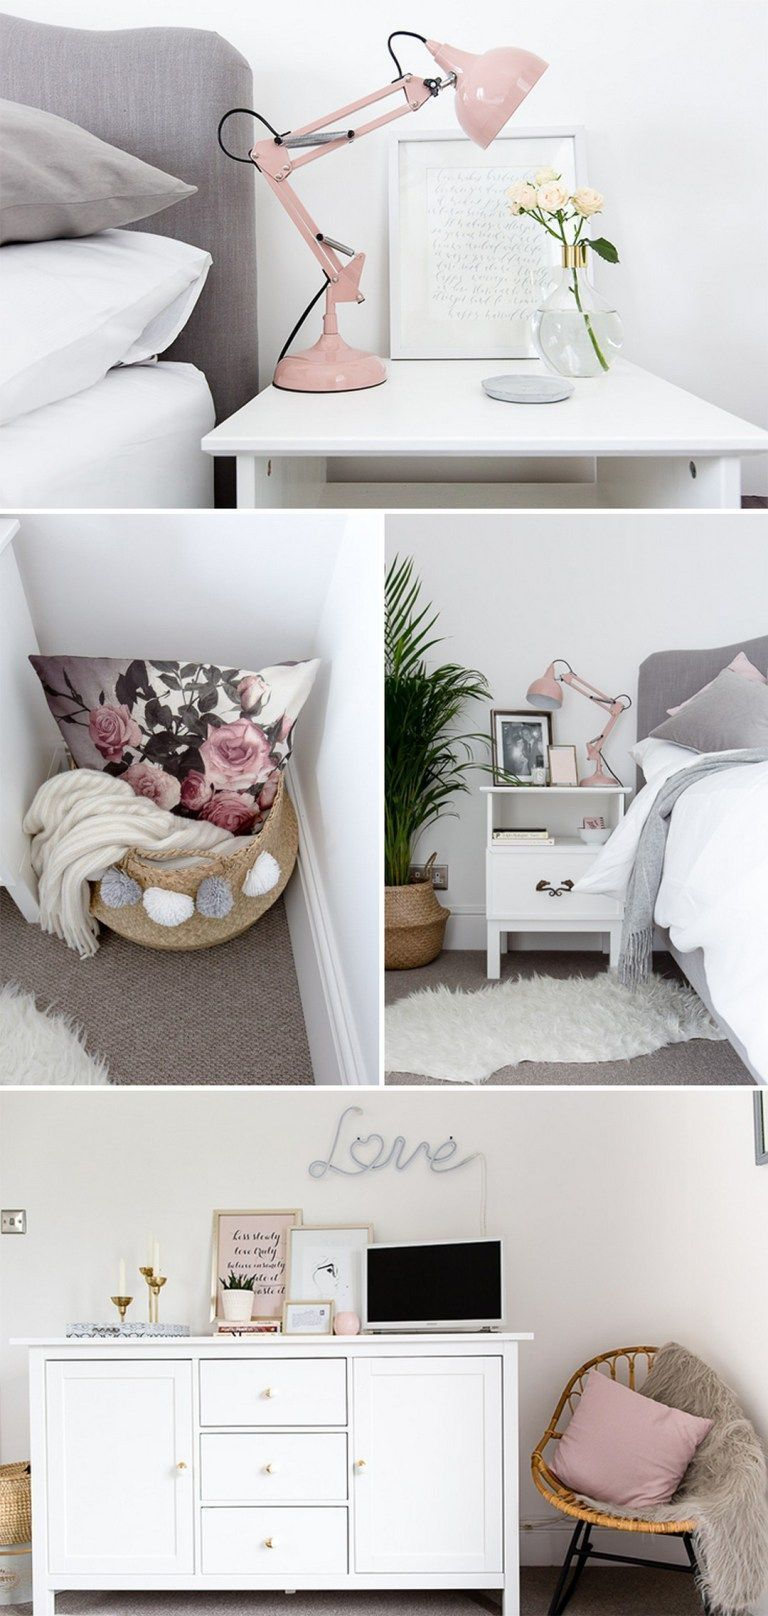 Cute Bedroom Design Idea Interior Design Bedroom Decor Room New Room